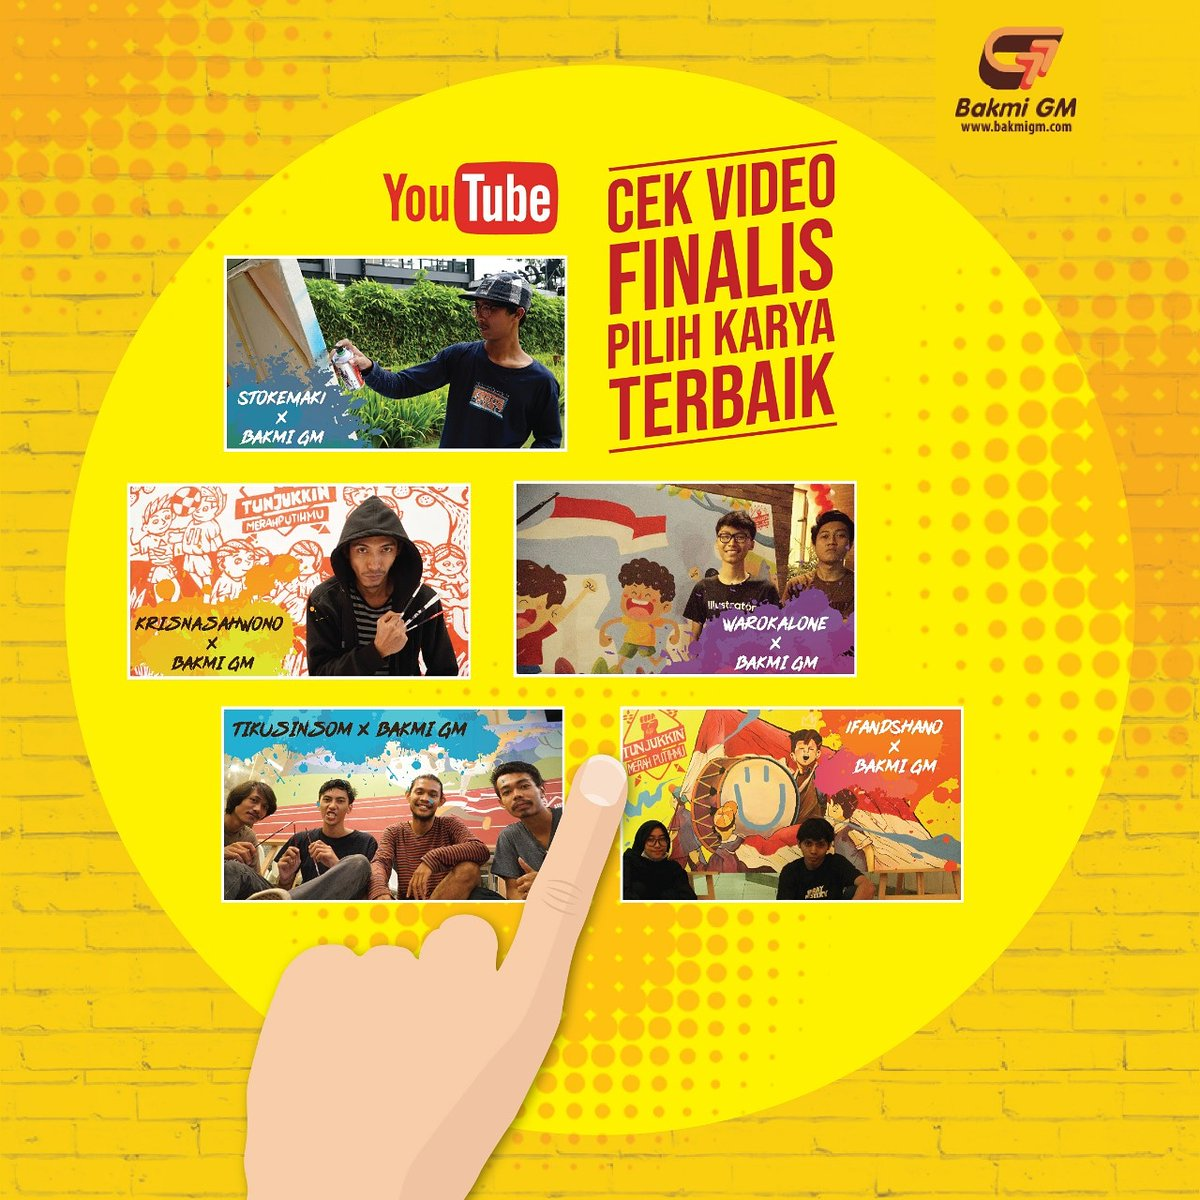 BakmiGM - Promo Vote Free Voucher Ratusan Ribu Rupiah (s.d 9 Okt 2018)